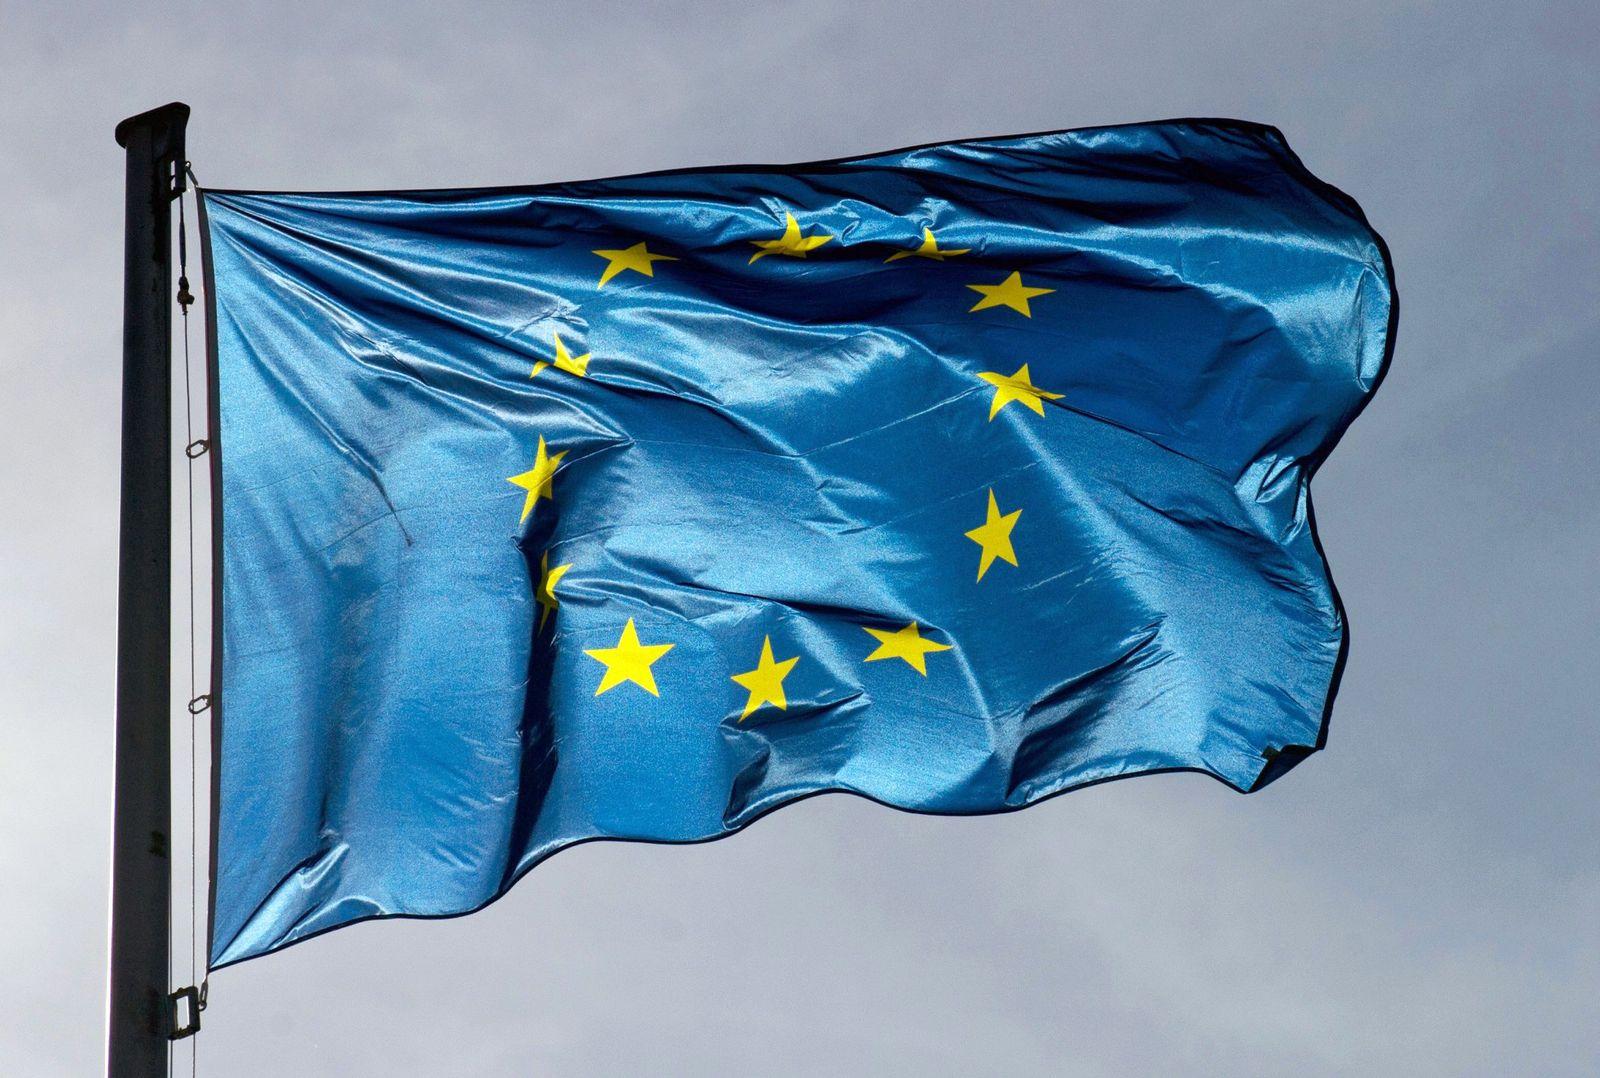 Single Euro Payments Area / SEPA / EU-Flagge